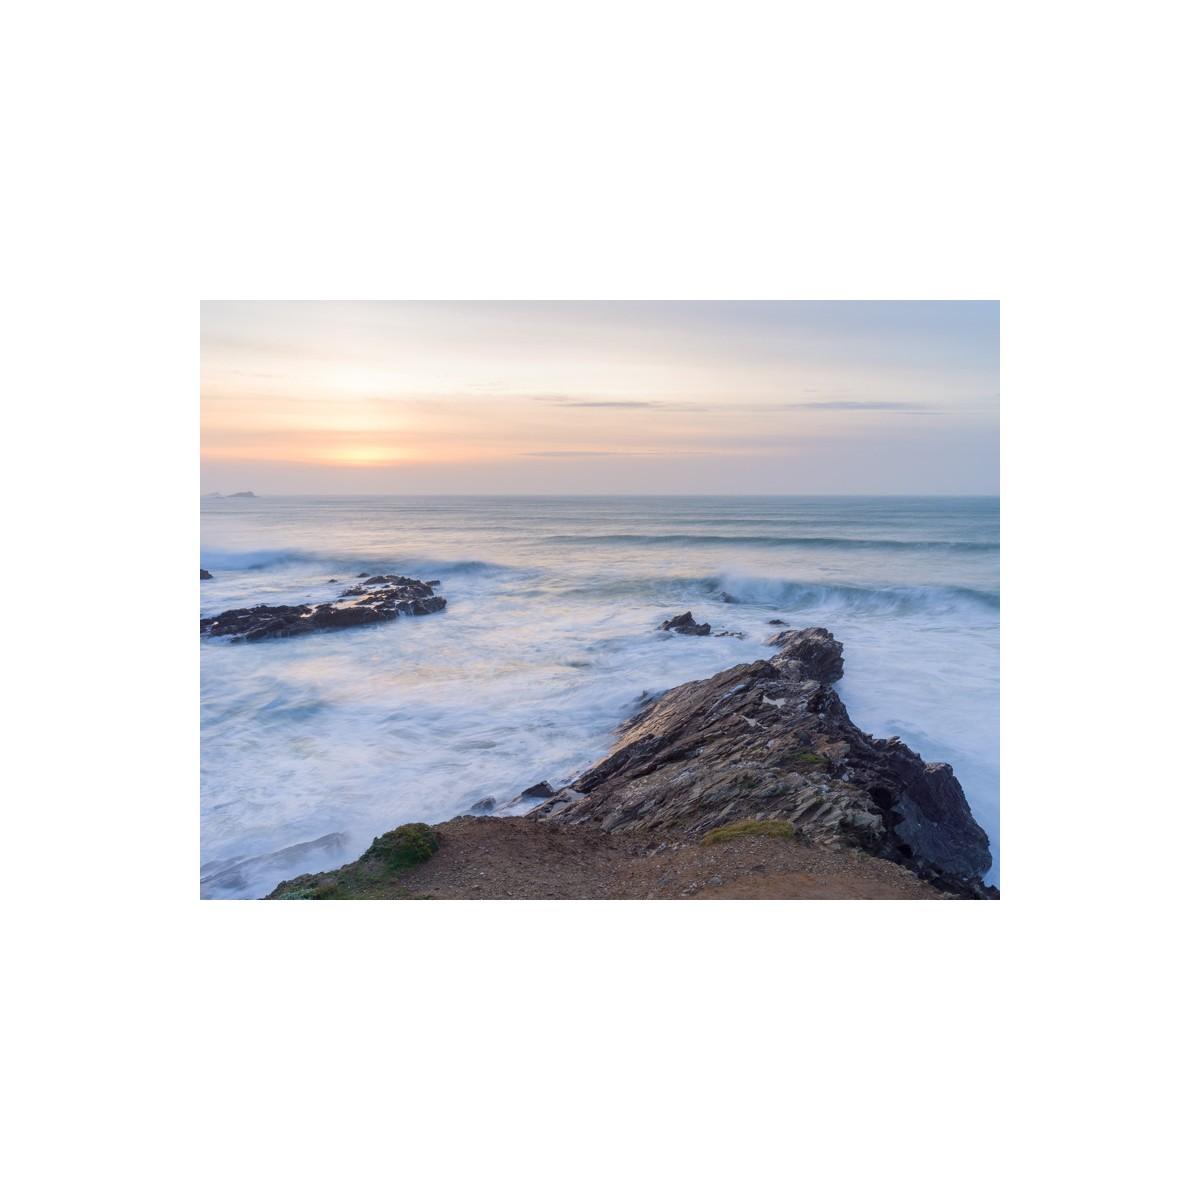 Fistral Beach Sunset II